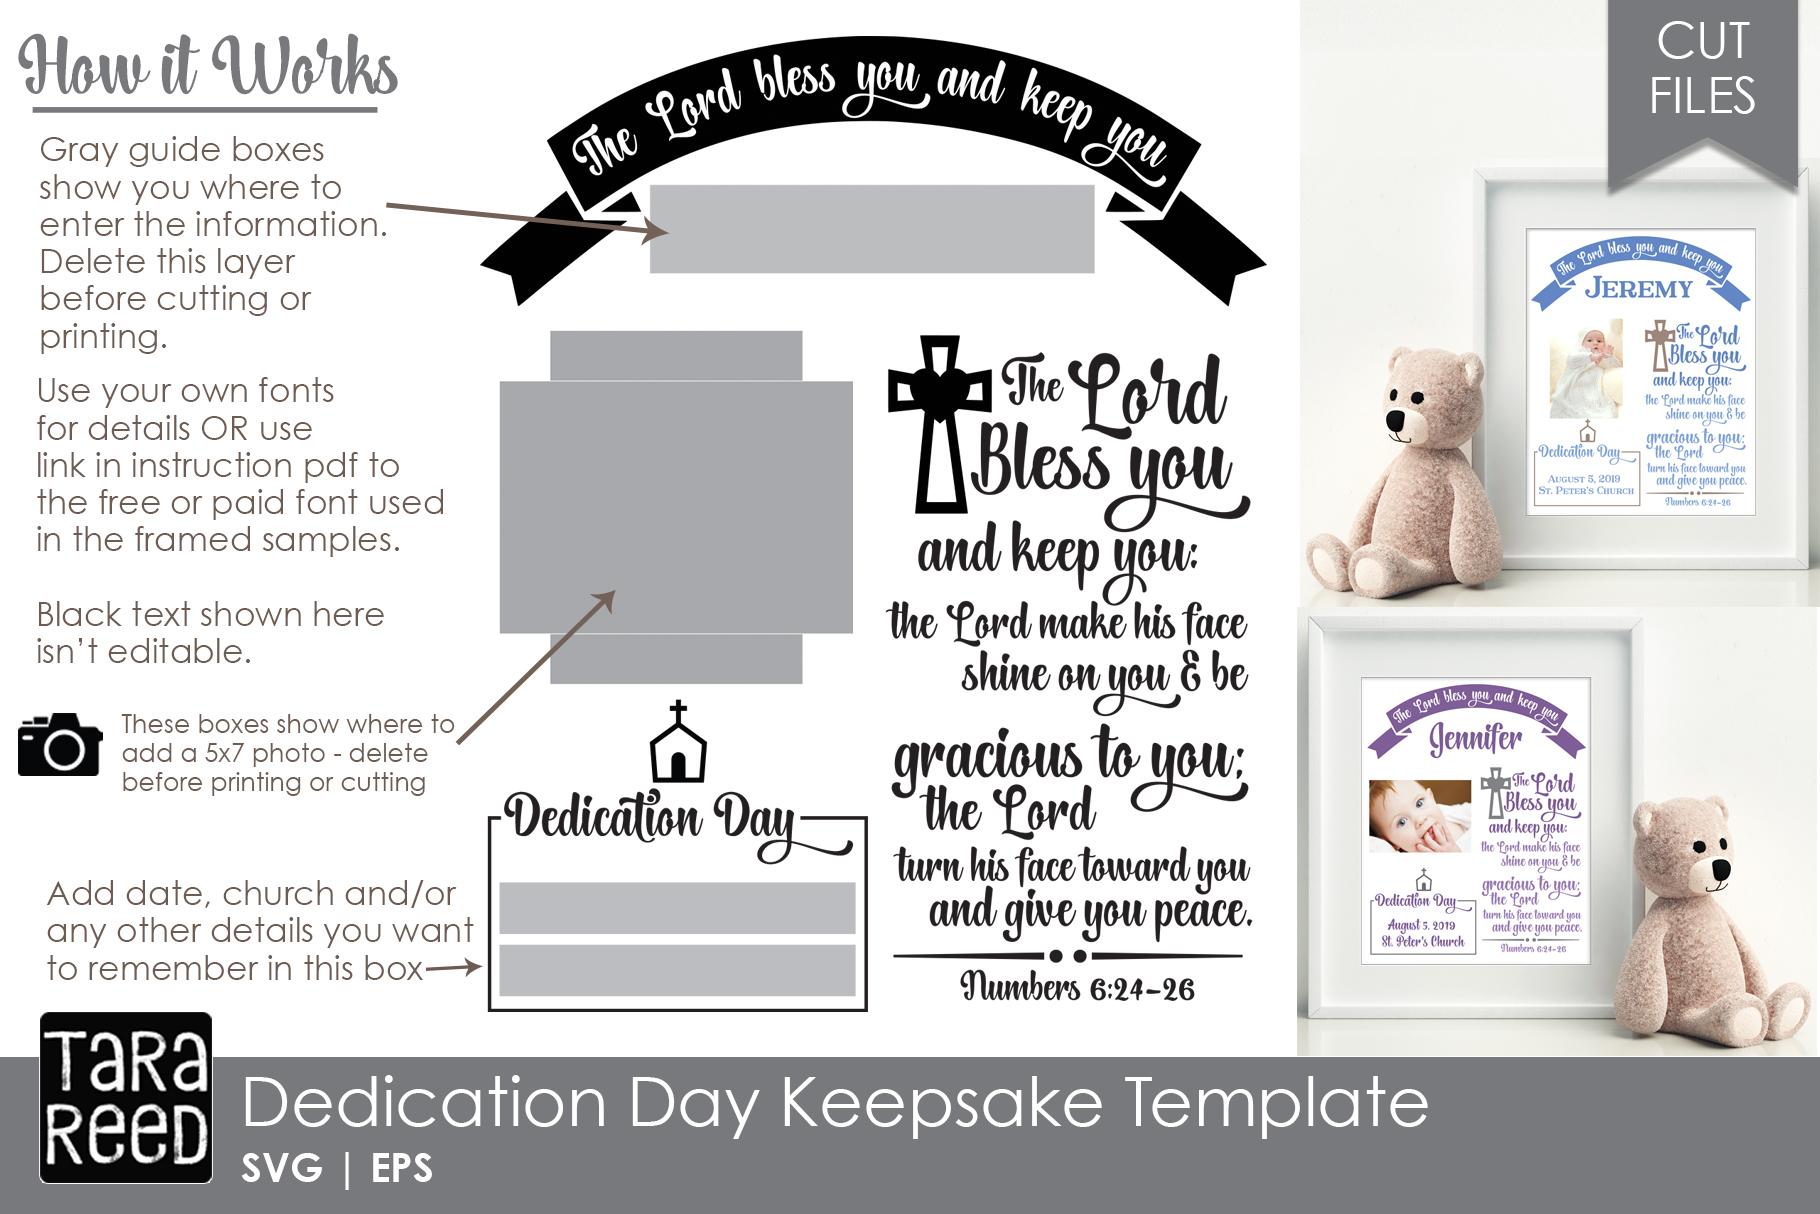 Personalized Dedication Day Keepsake Template example image 2